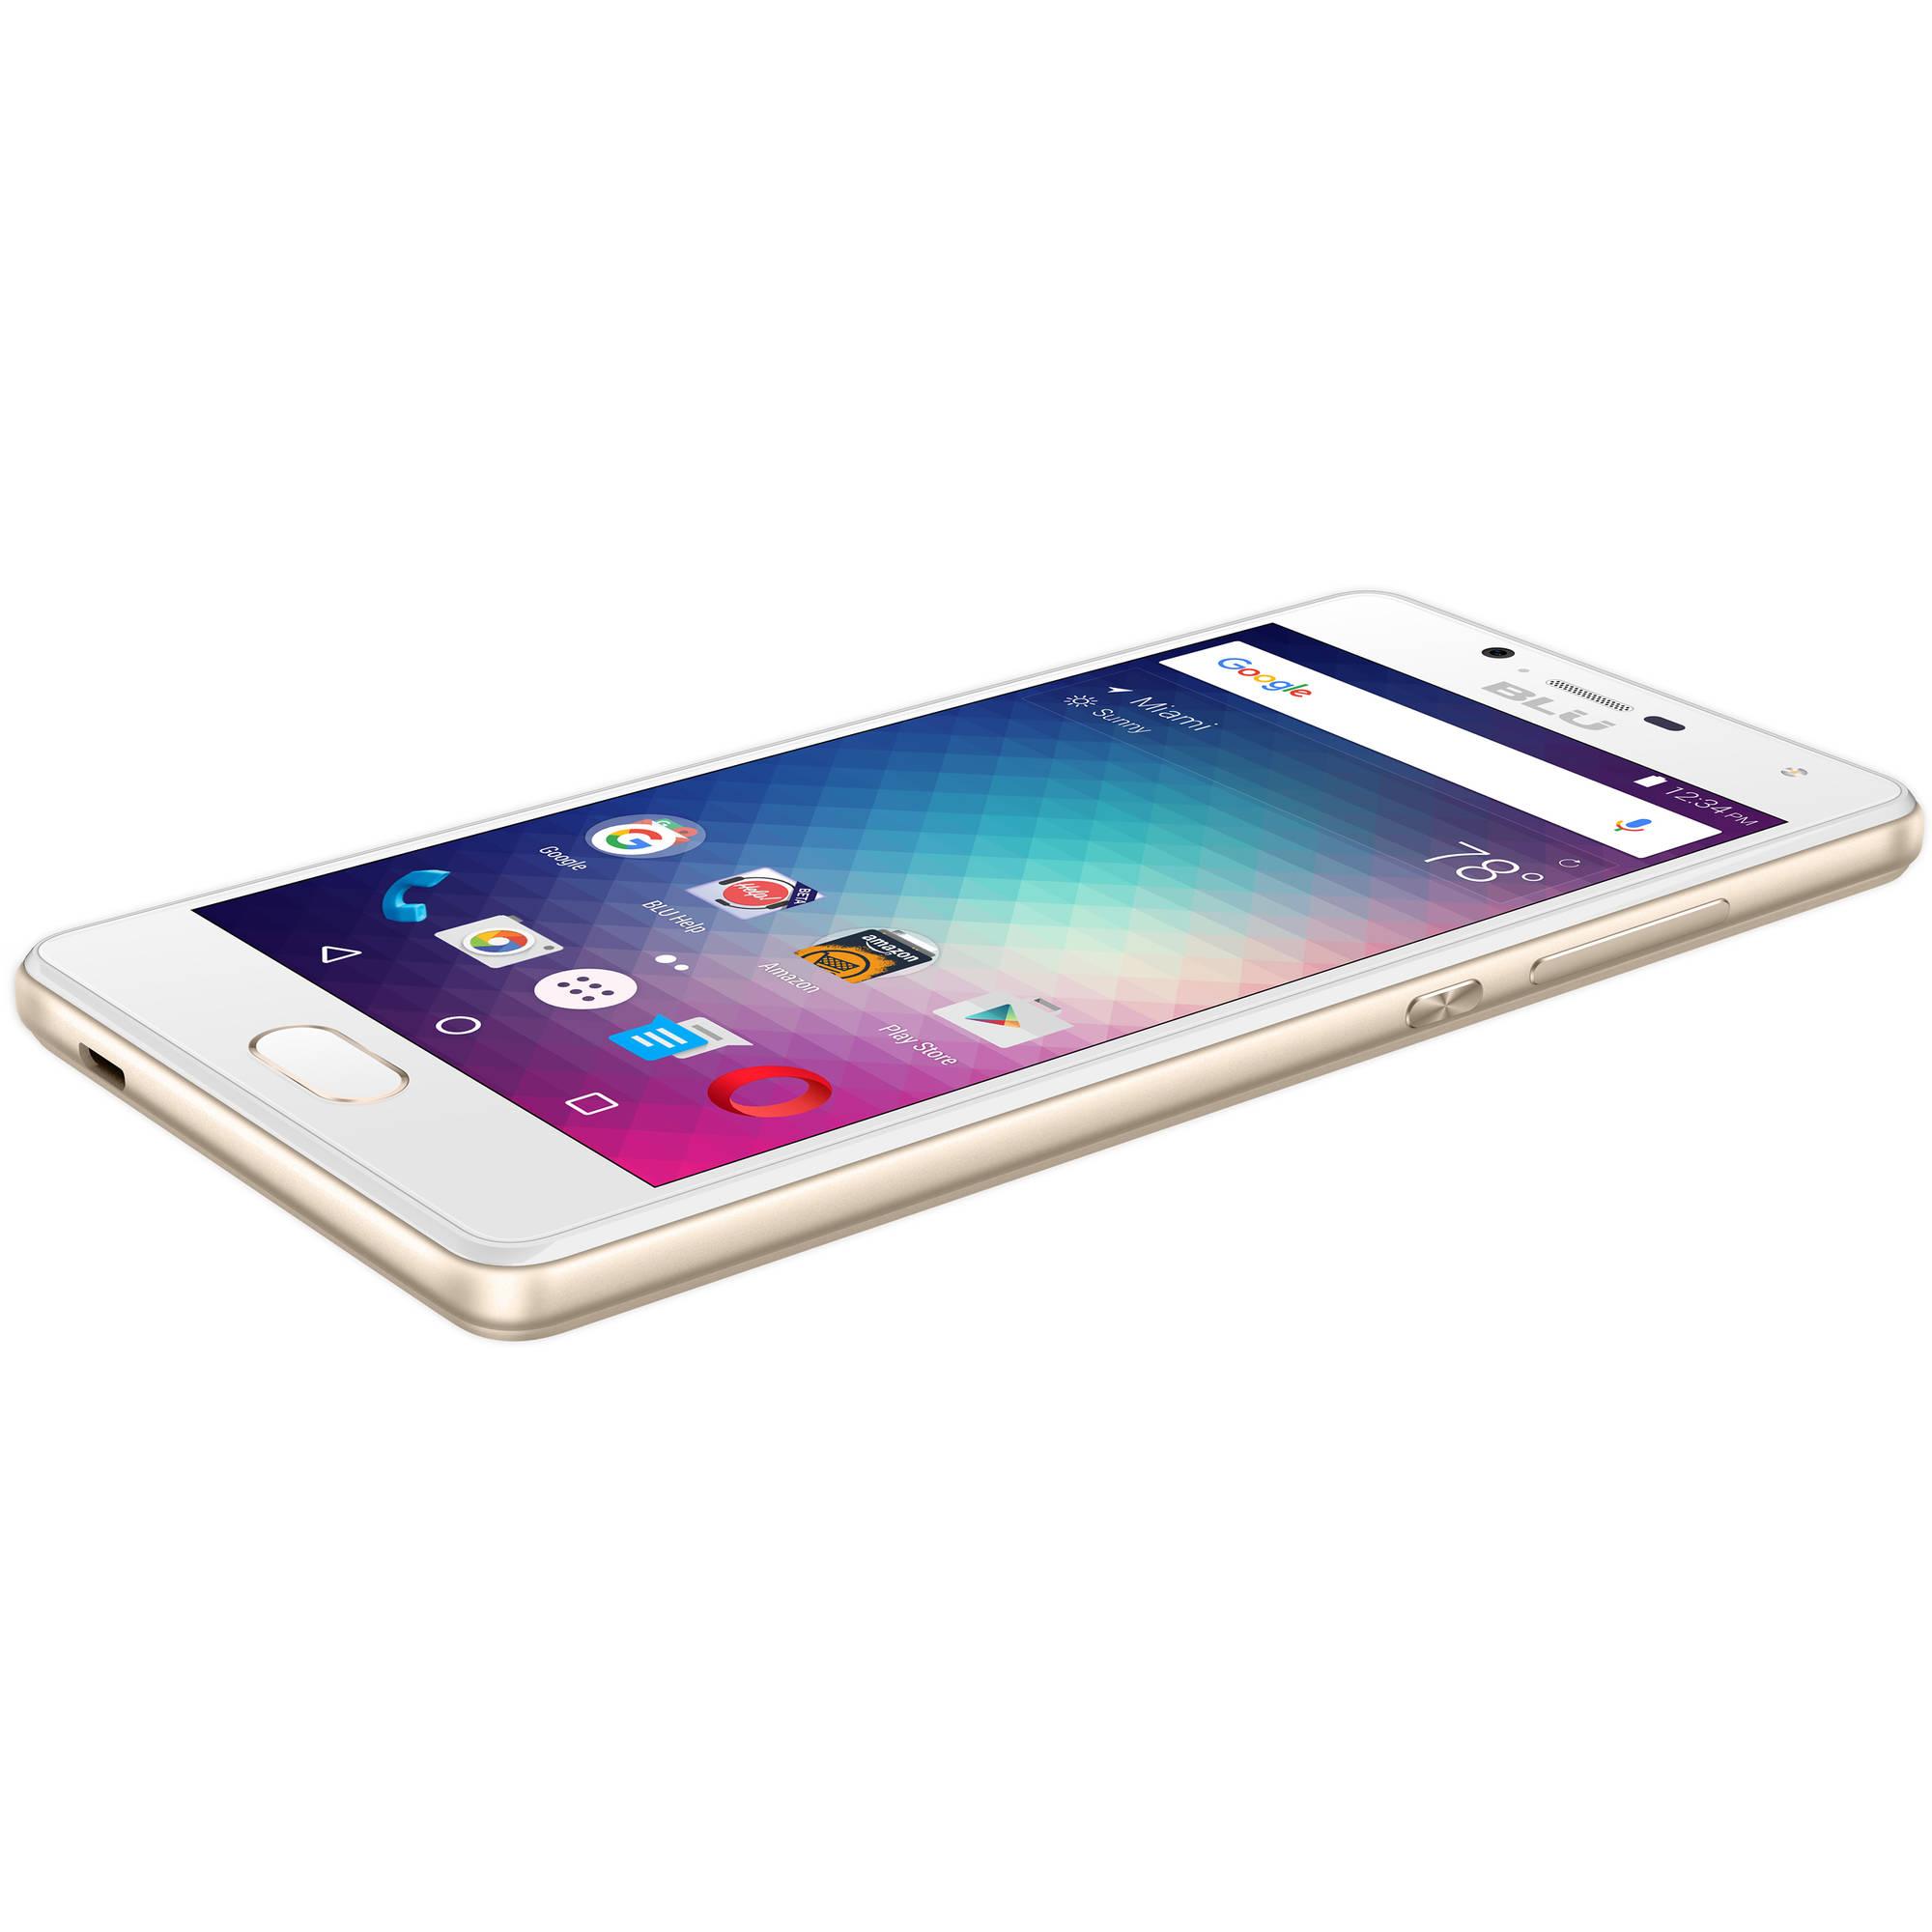 BLU Studio Touch S0211UU 16GB Smartphone (Unlocked, Gold)